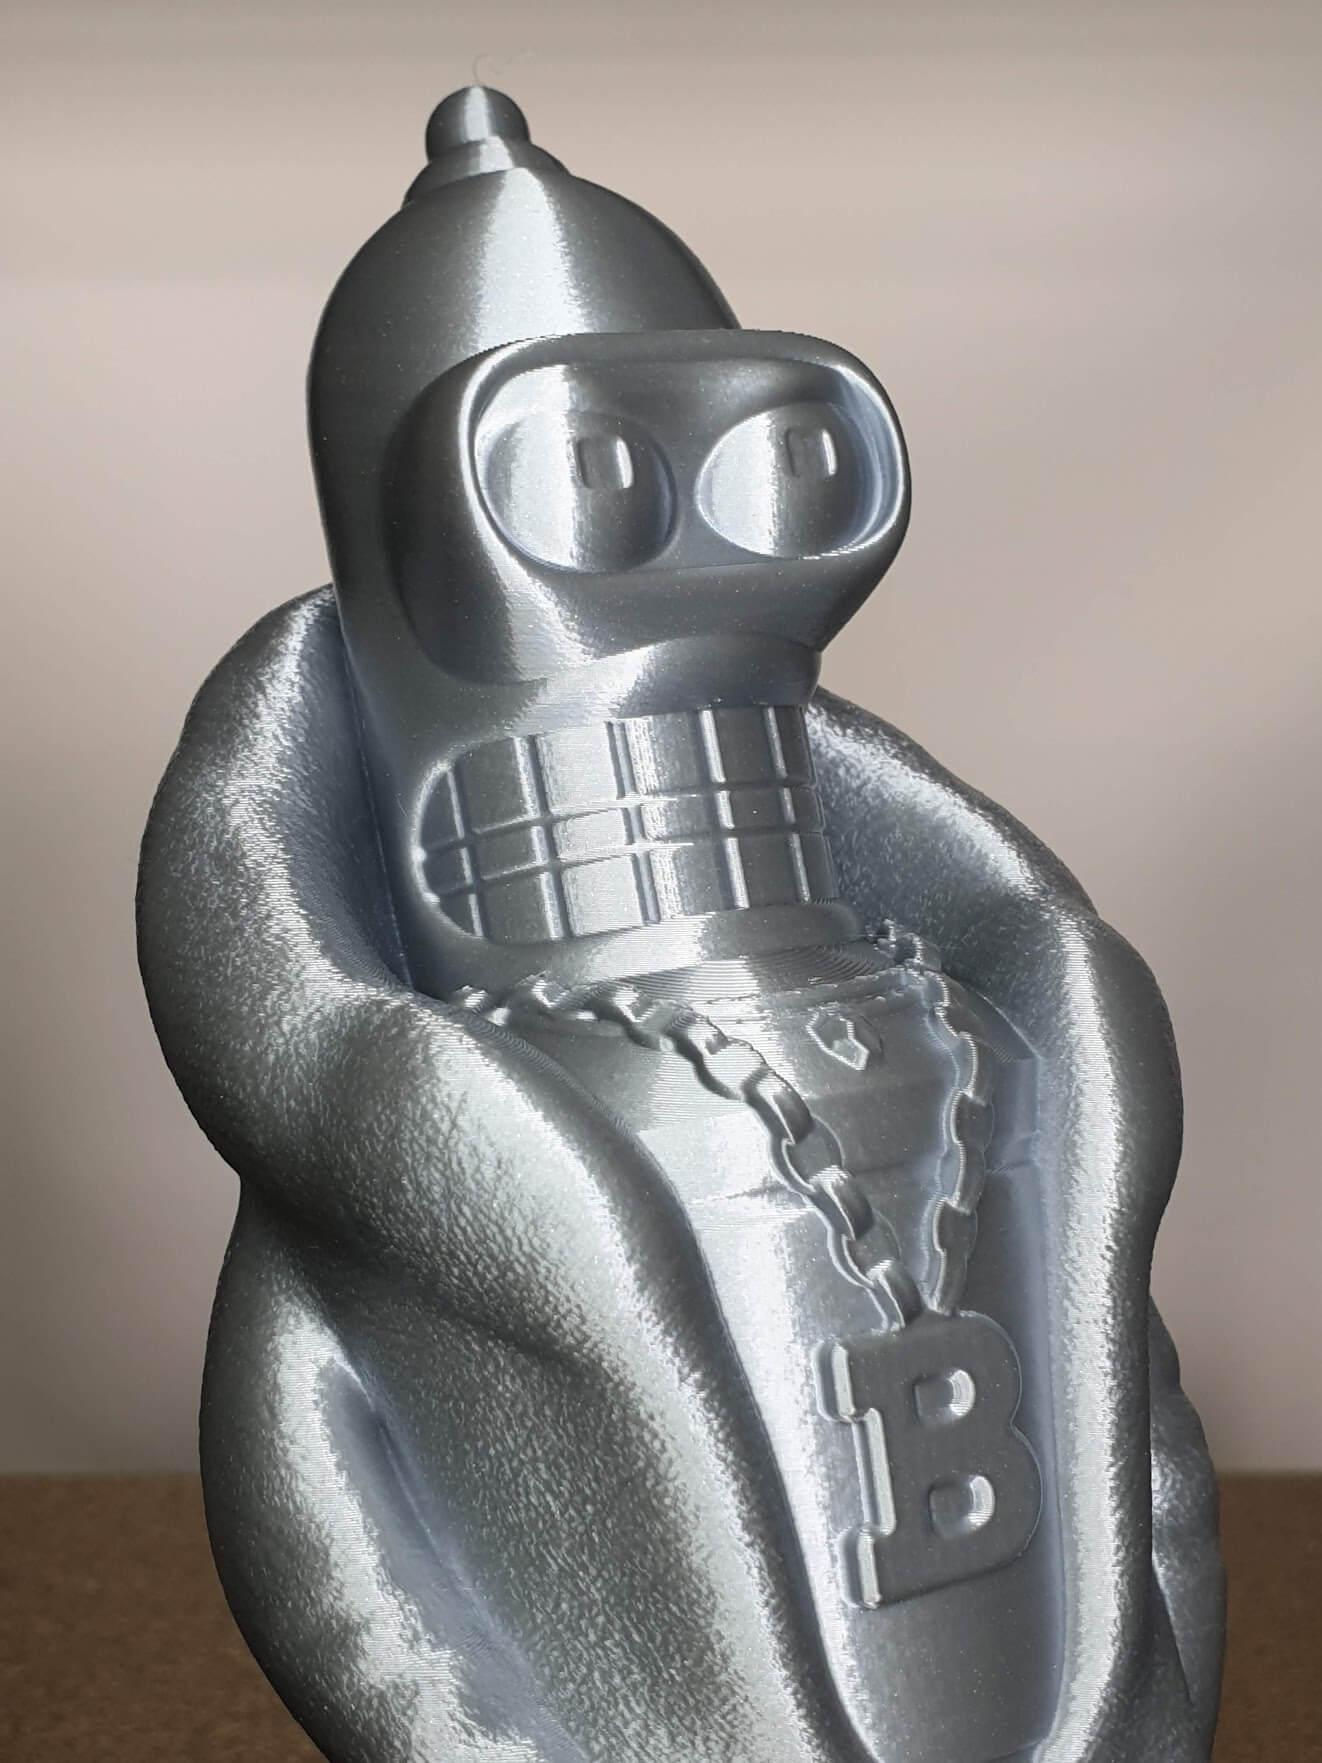 Bender - Island 3D Printing Ideas for Beginners